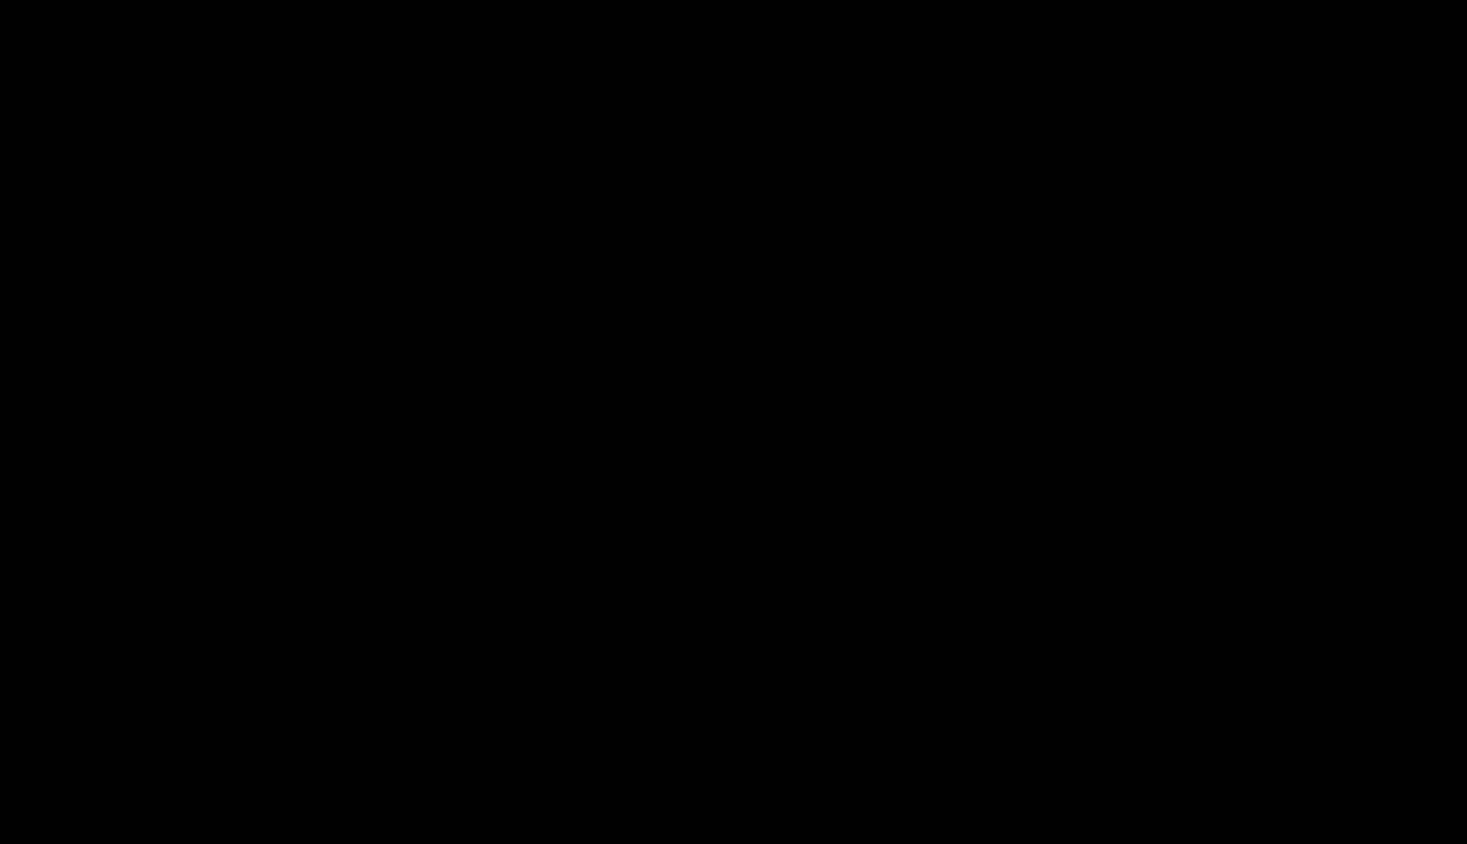 Biotin-dPEG®₁₁-MAL